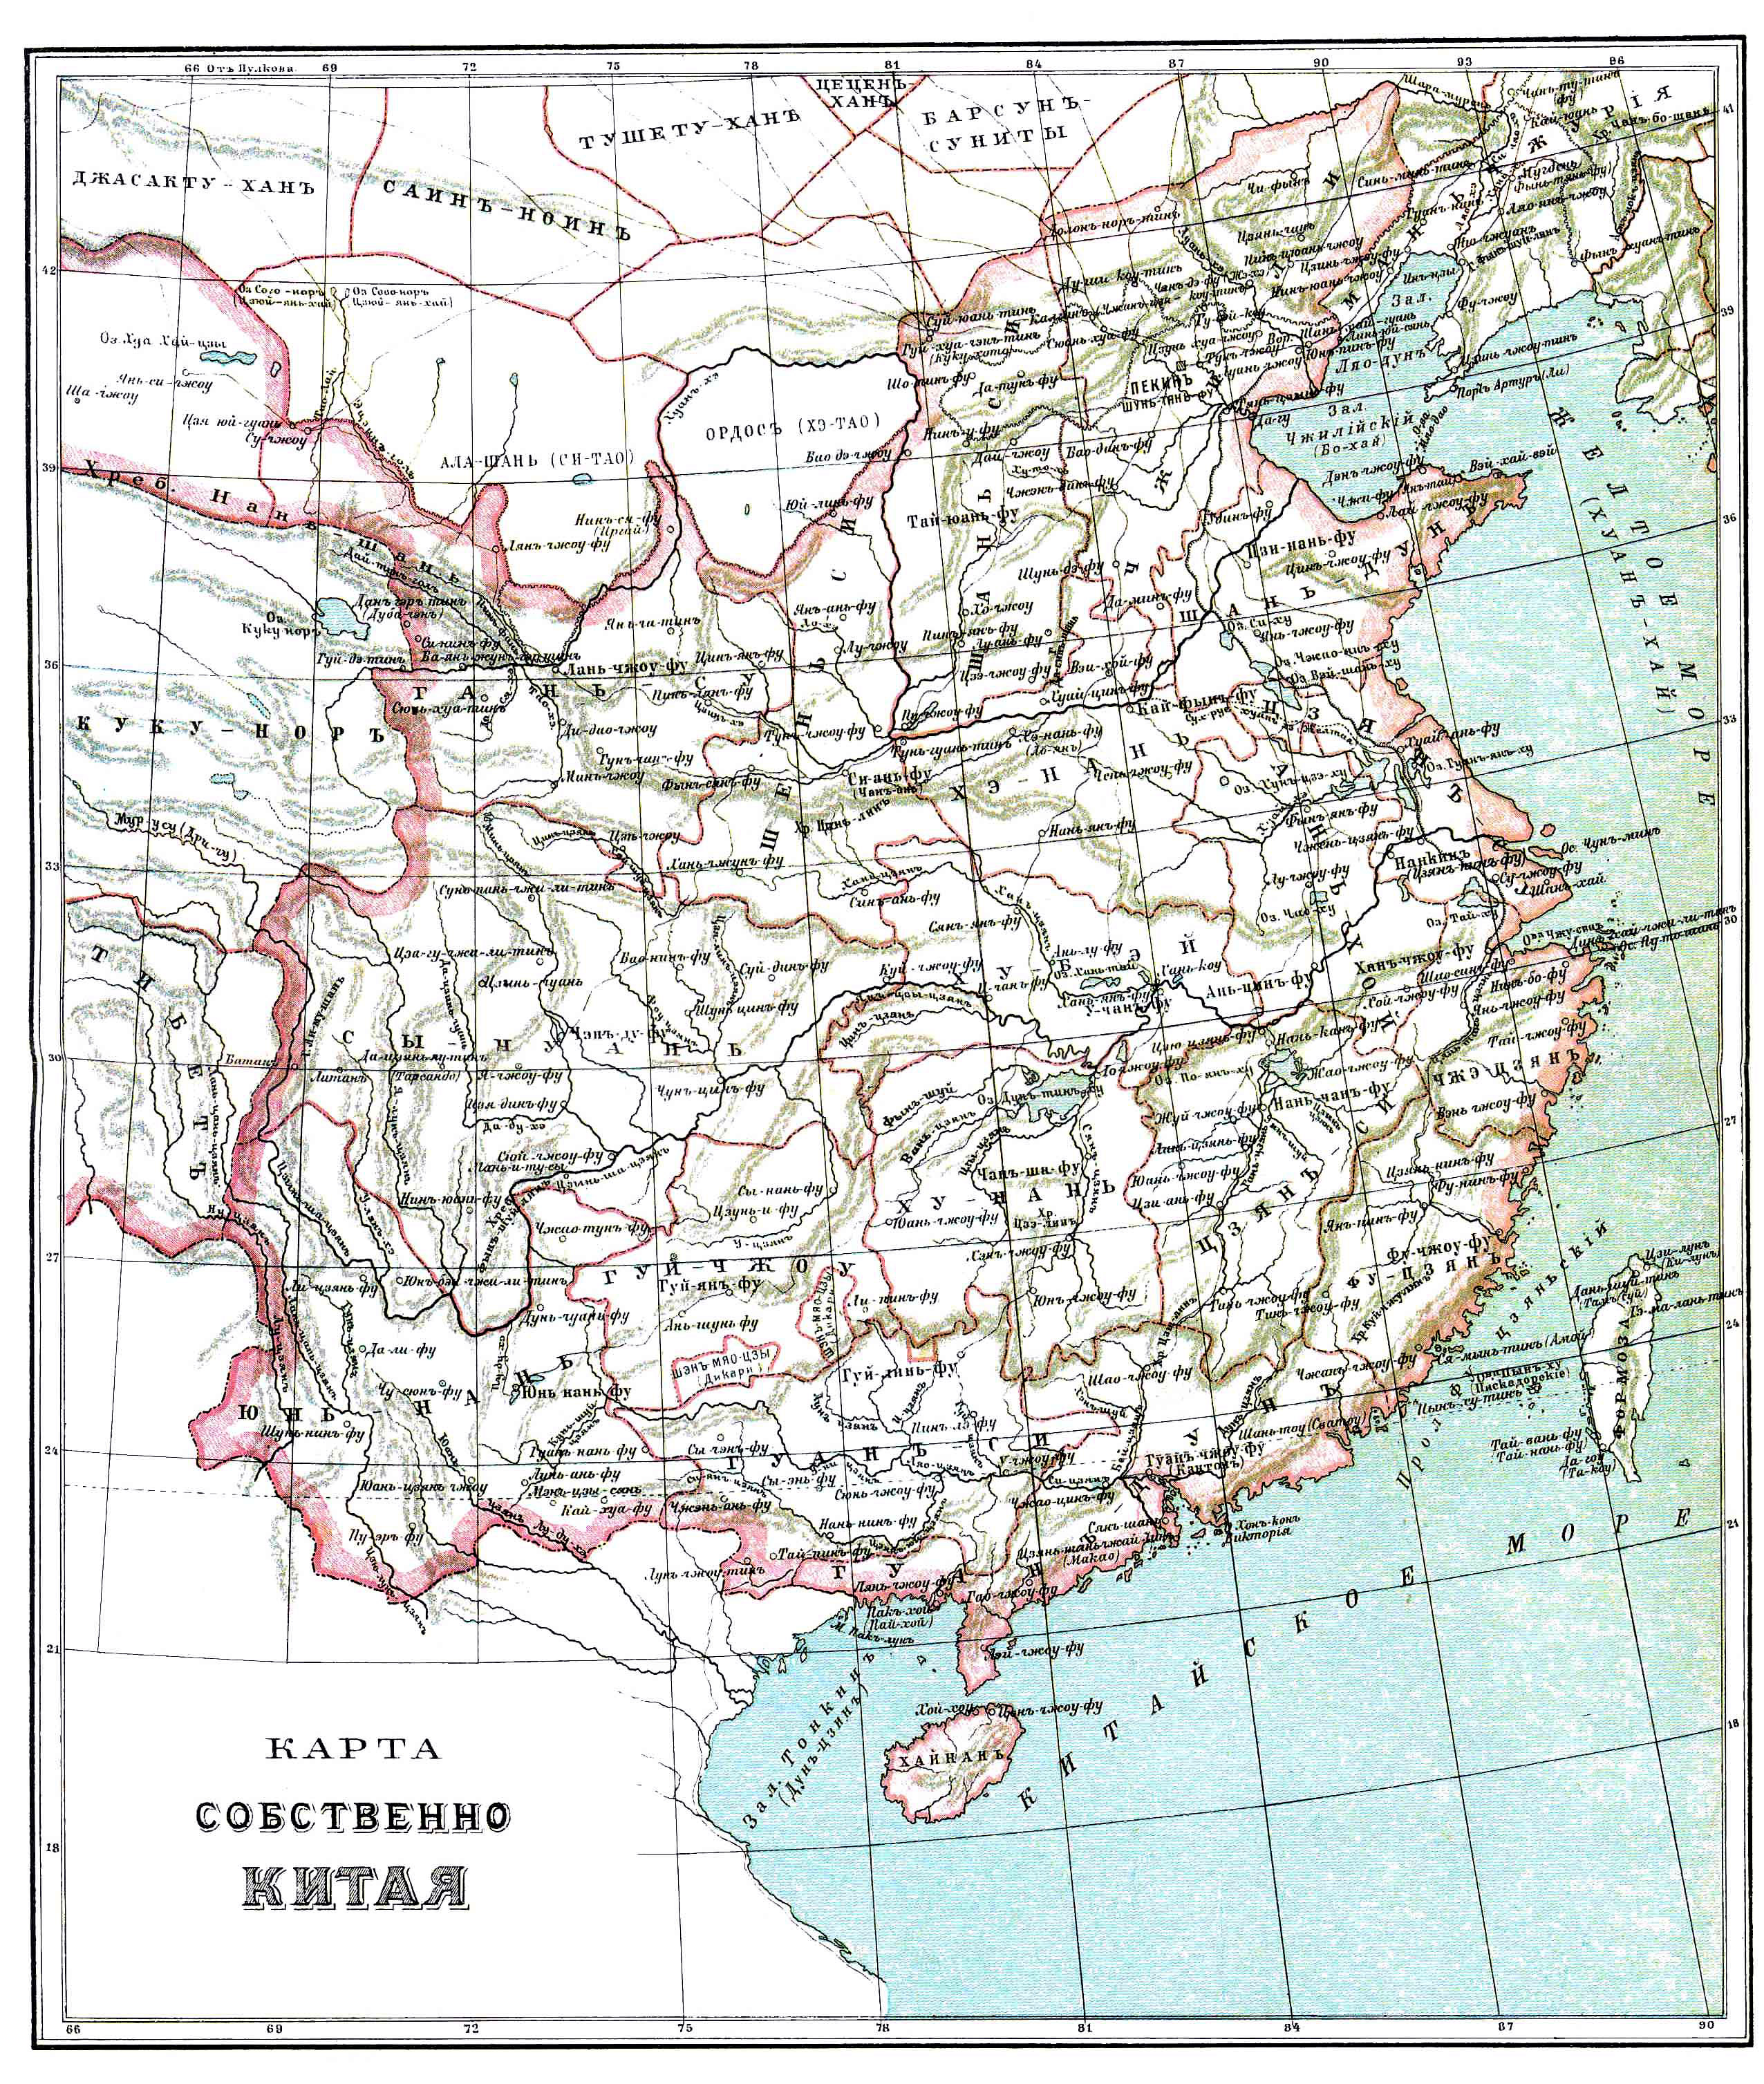 Brockhaus and Efron Encyclopedic Dictionary b29 184-0.jpg